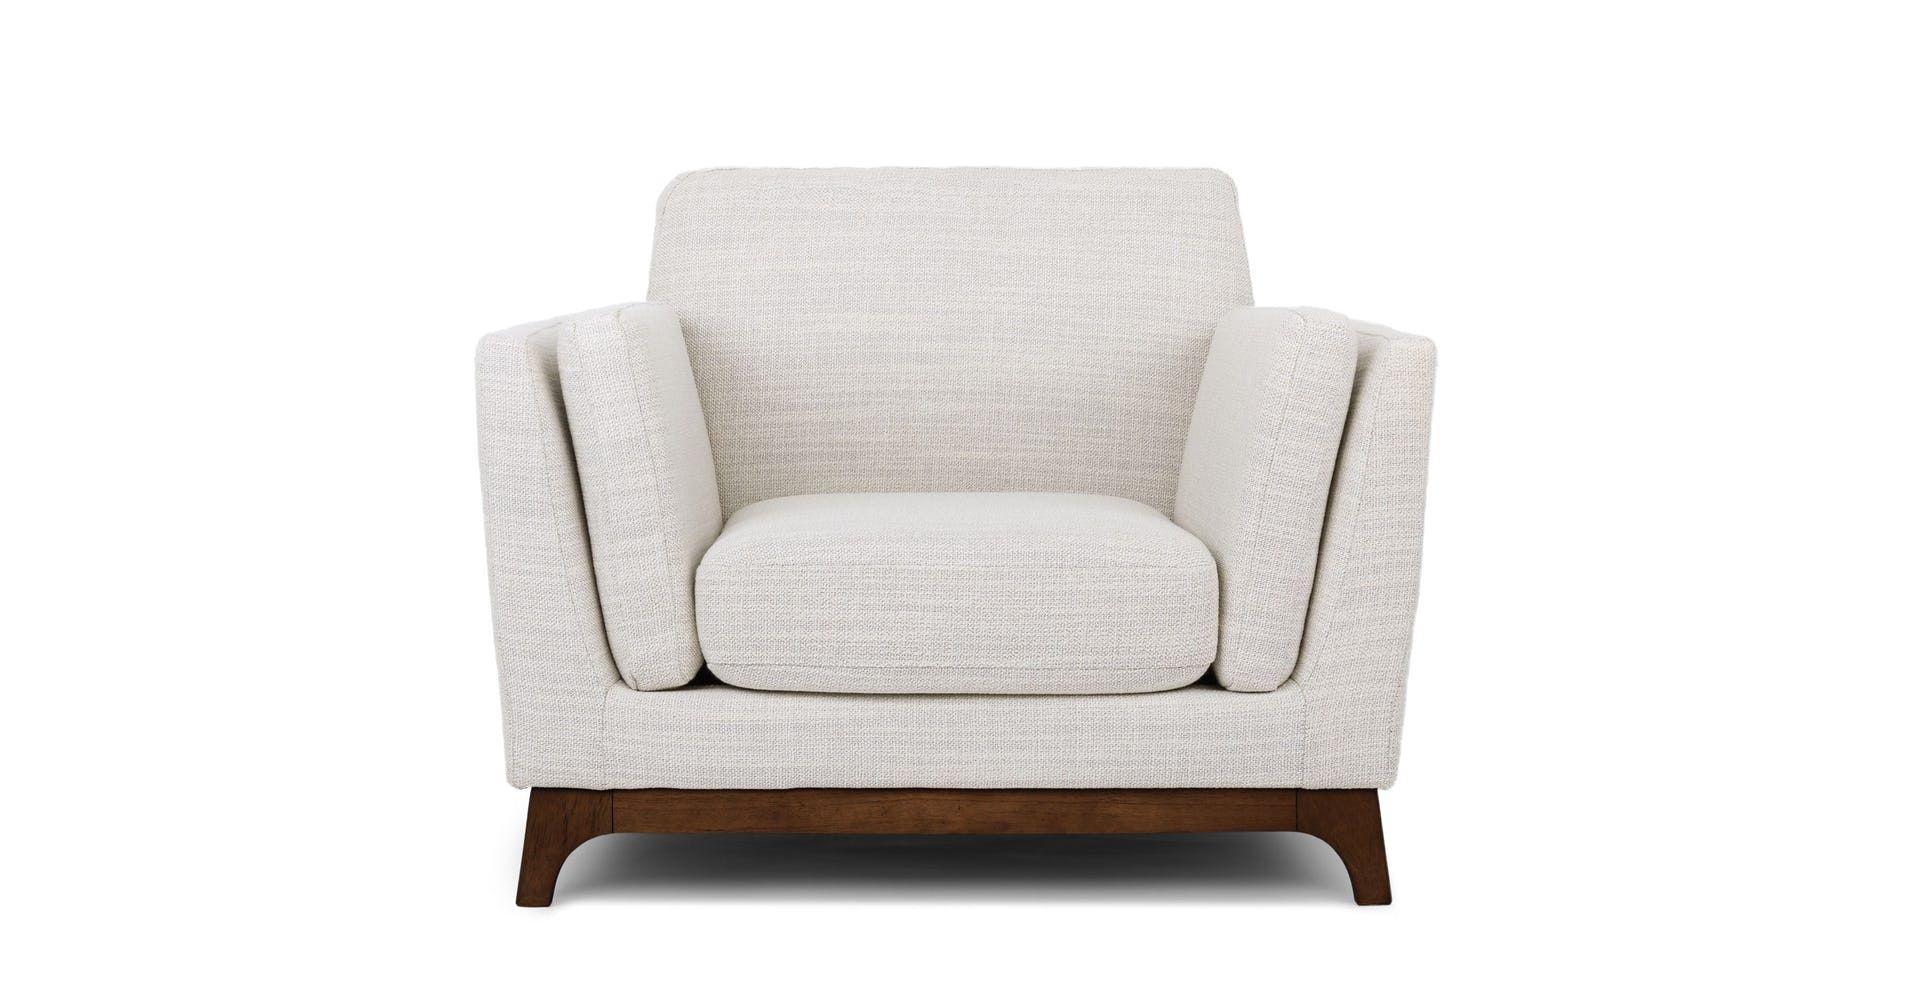 Ceni Fresh White Armchair White Armchair Mid Century Modern Lounge Chairs Armchair